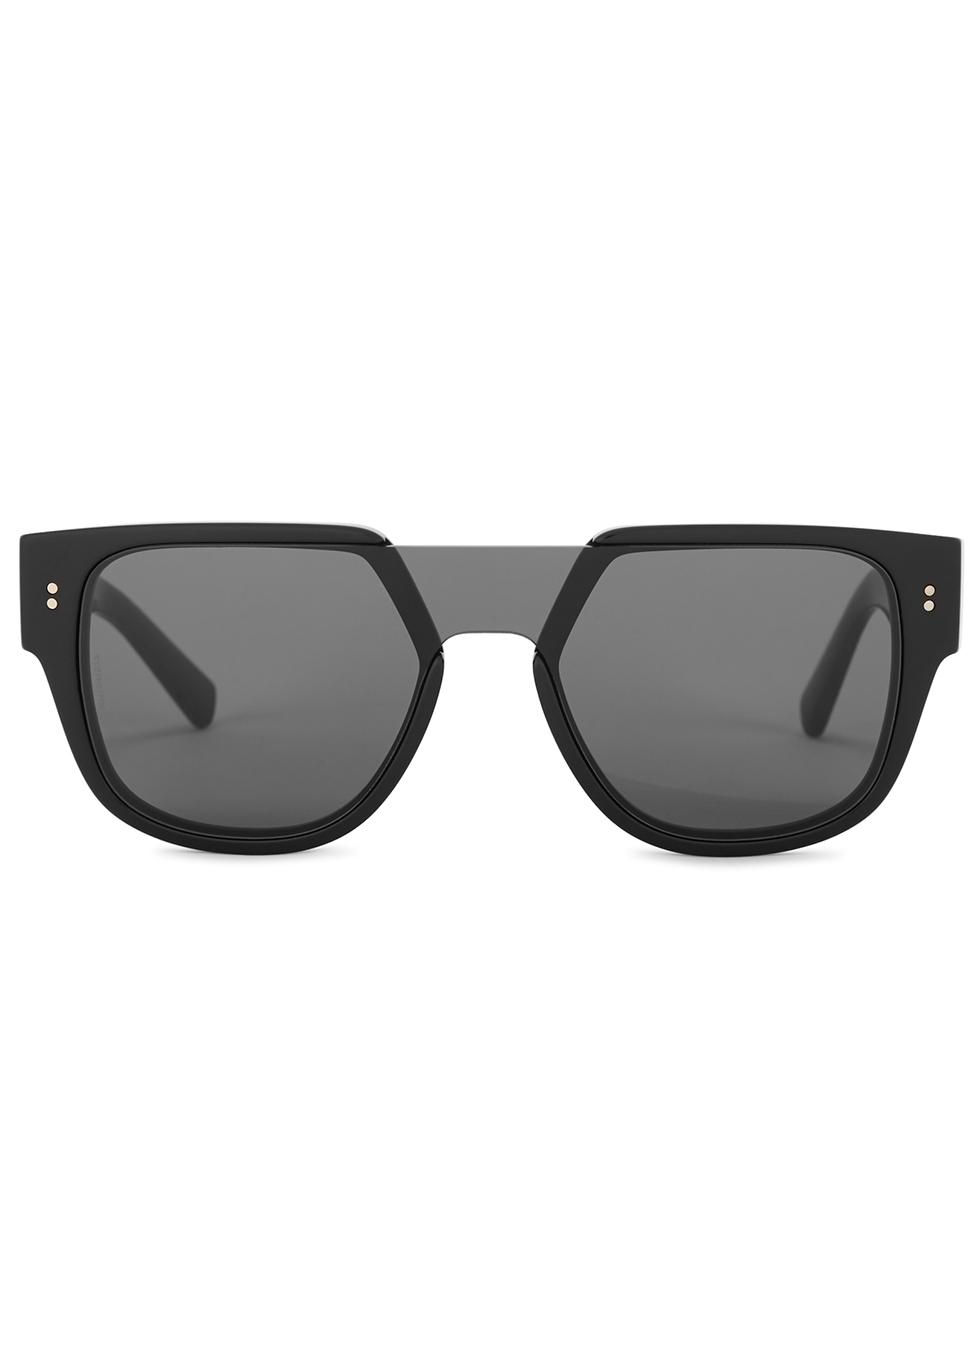 Black D-frame sunglasses - Dolce & Gabbana